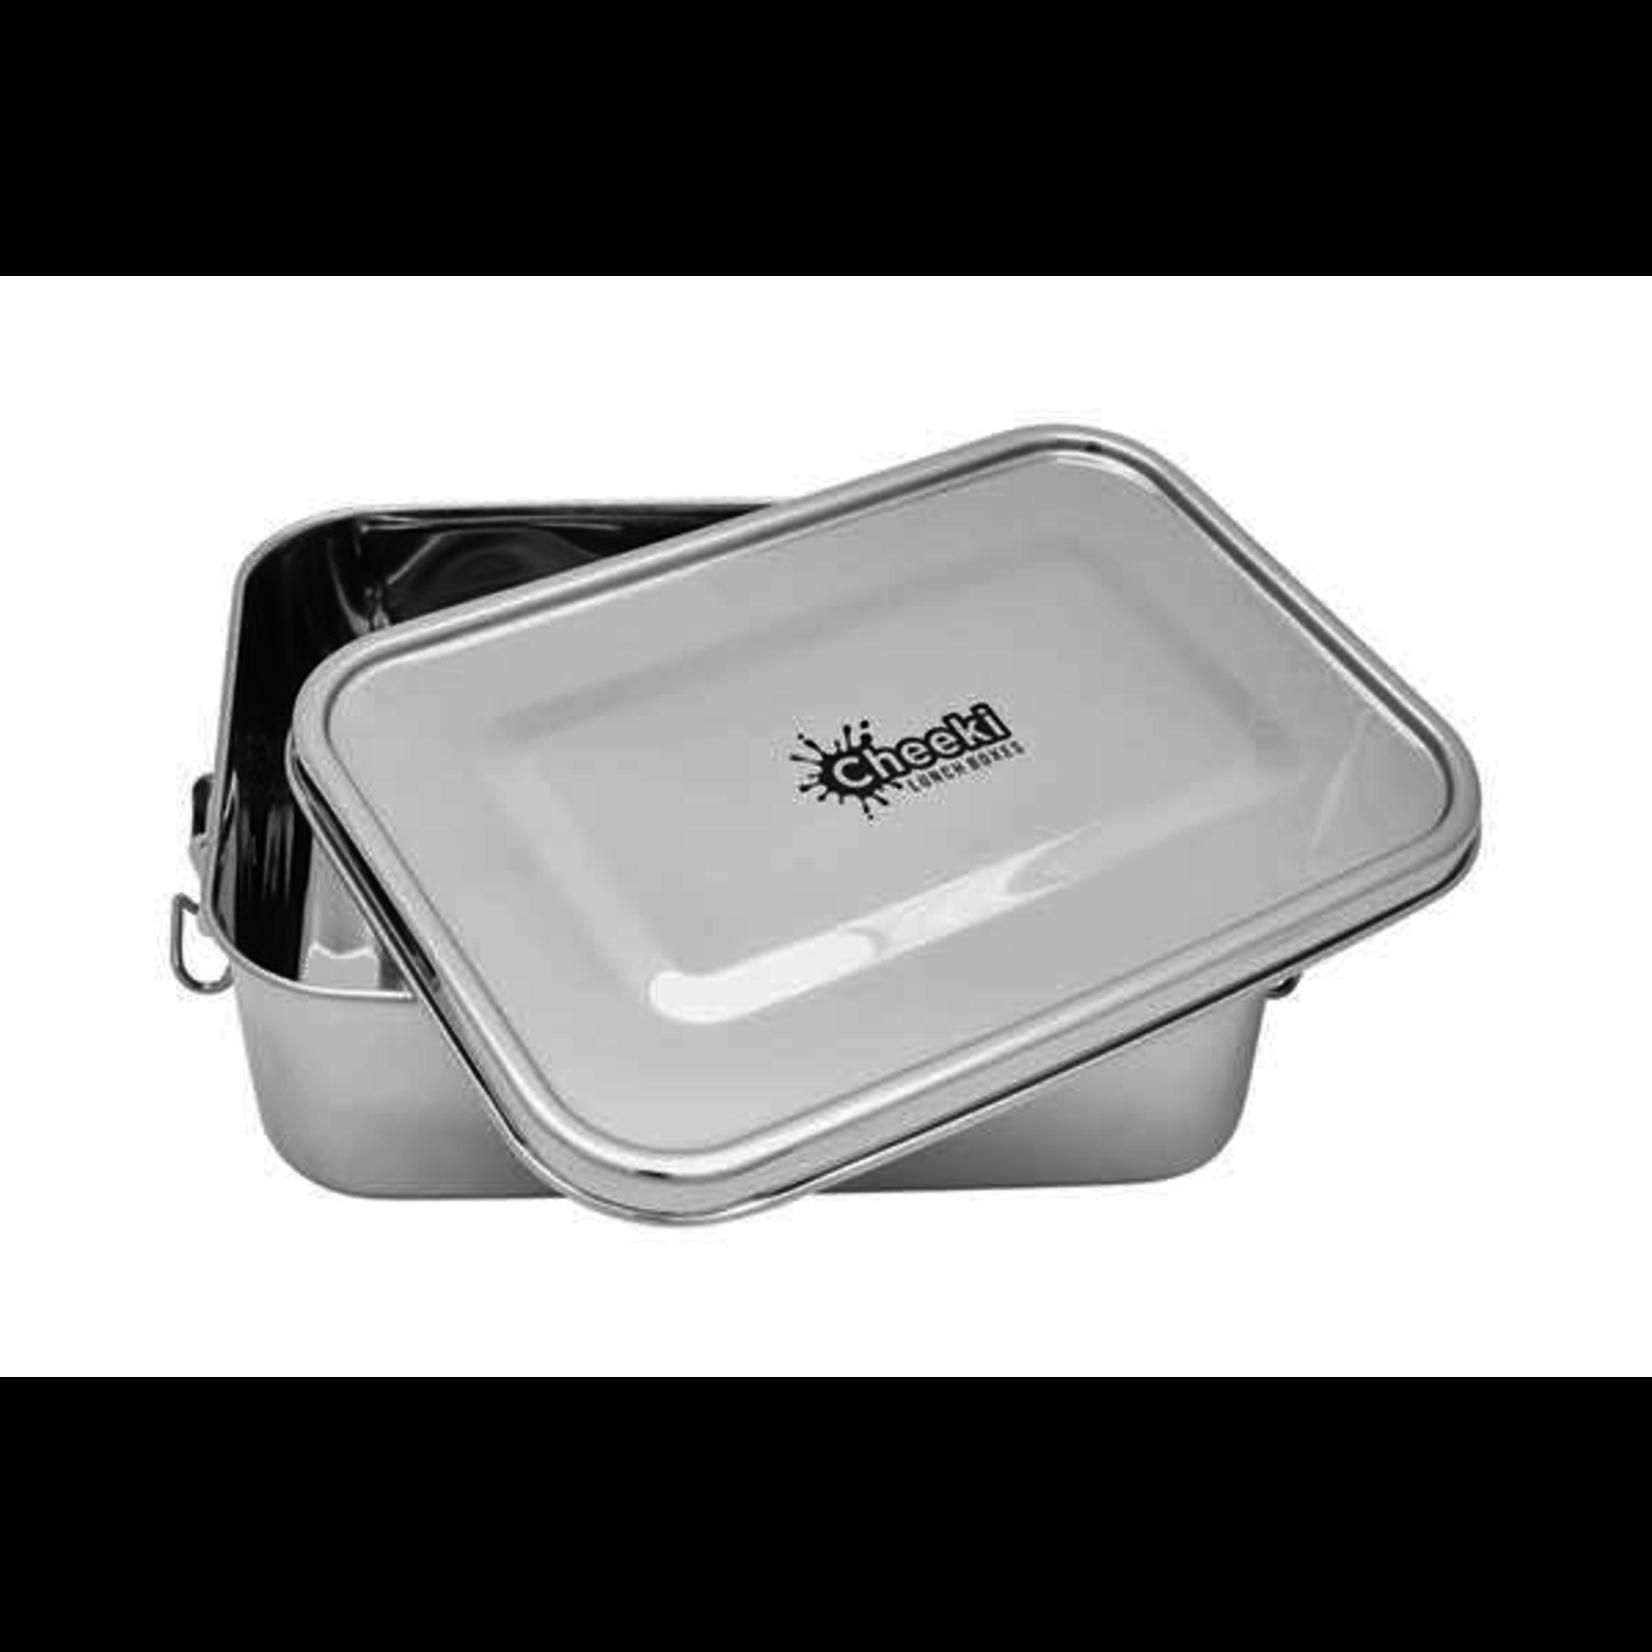 Cheeki Cheeki 1.6L Lunch Box - Hungry Max